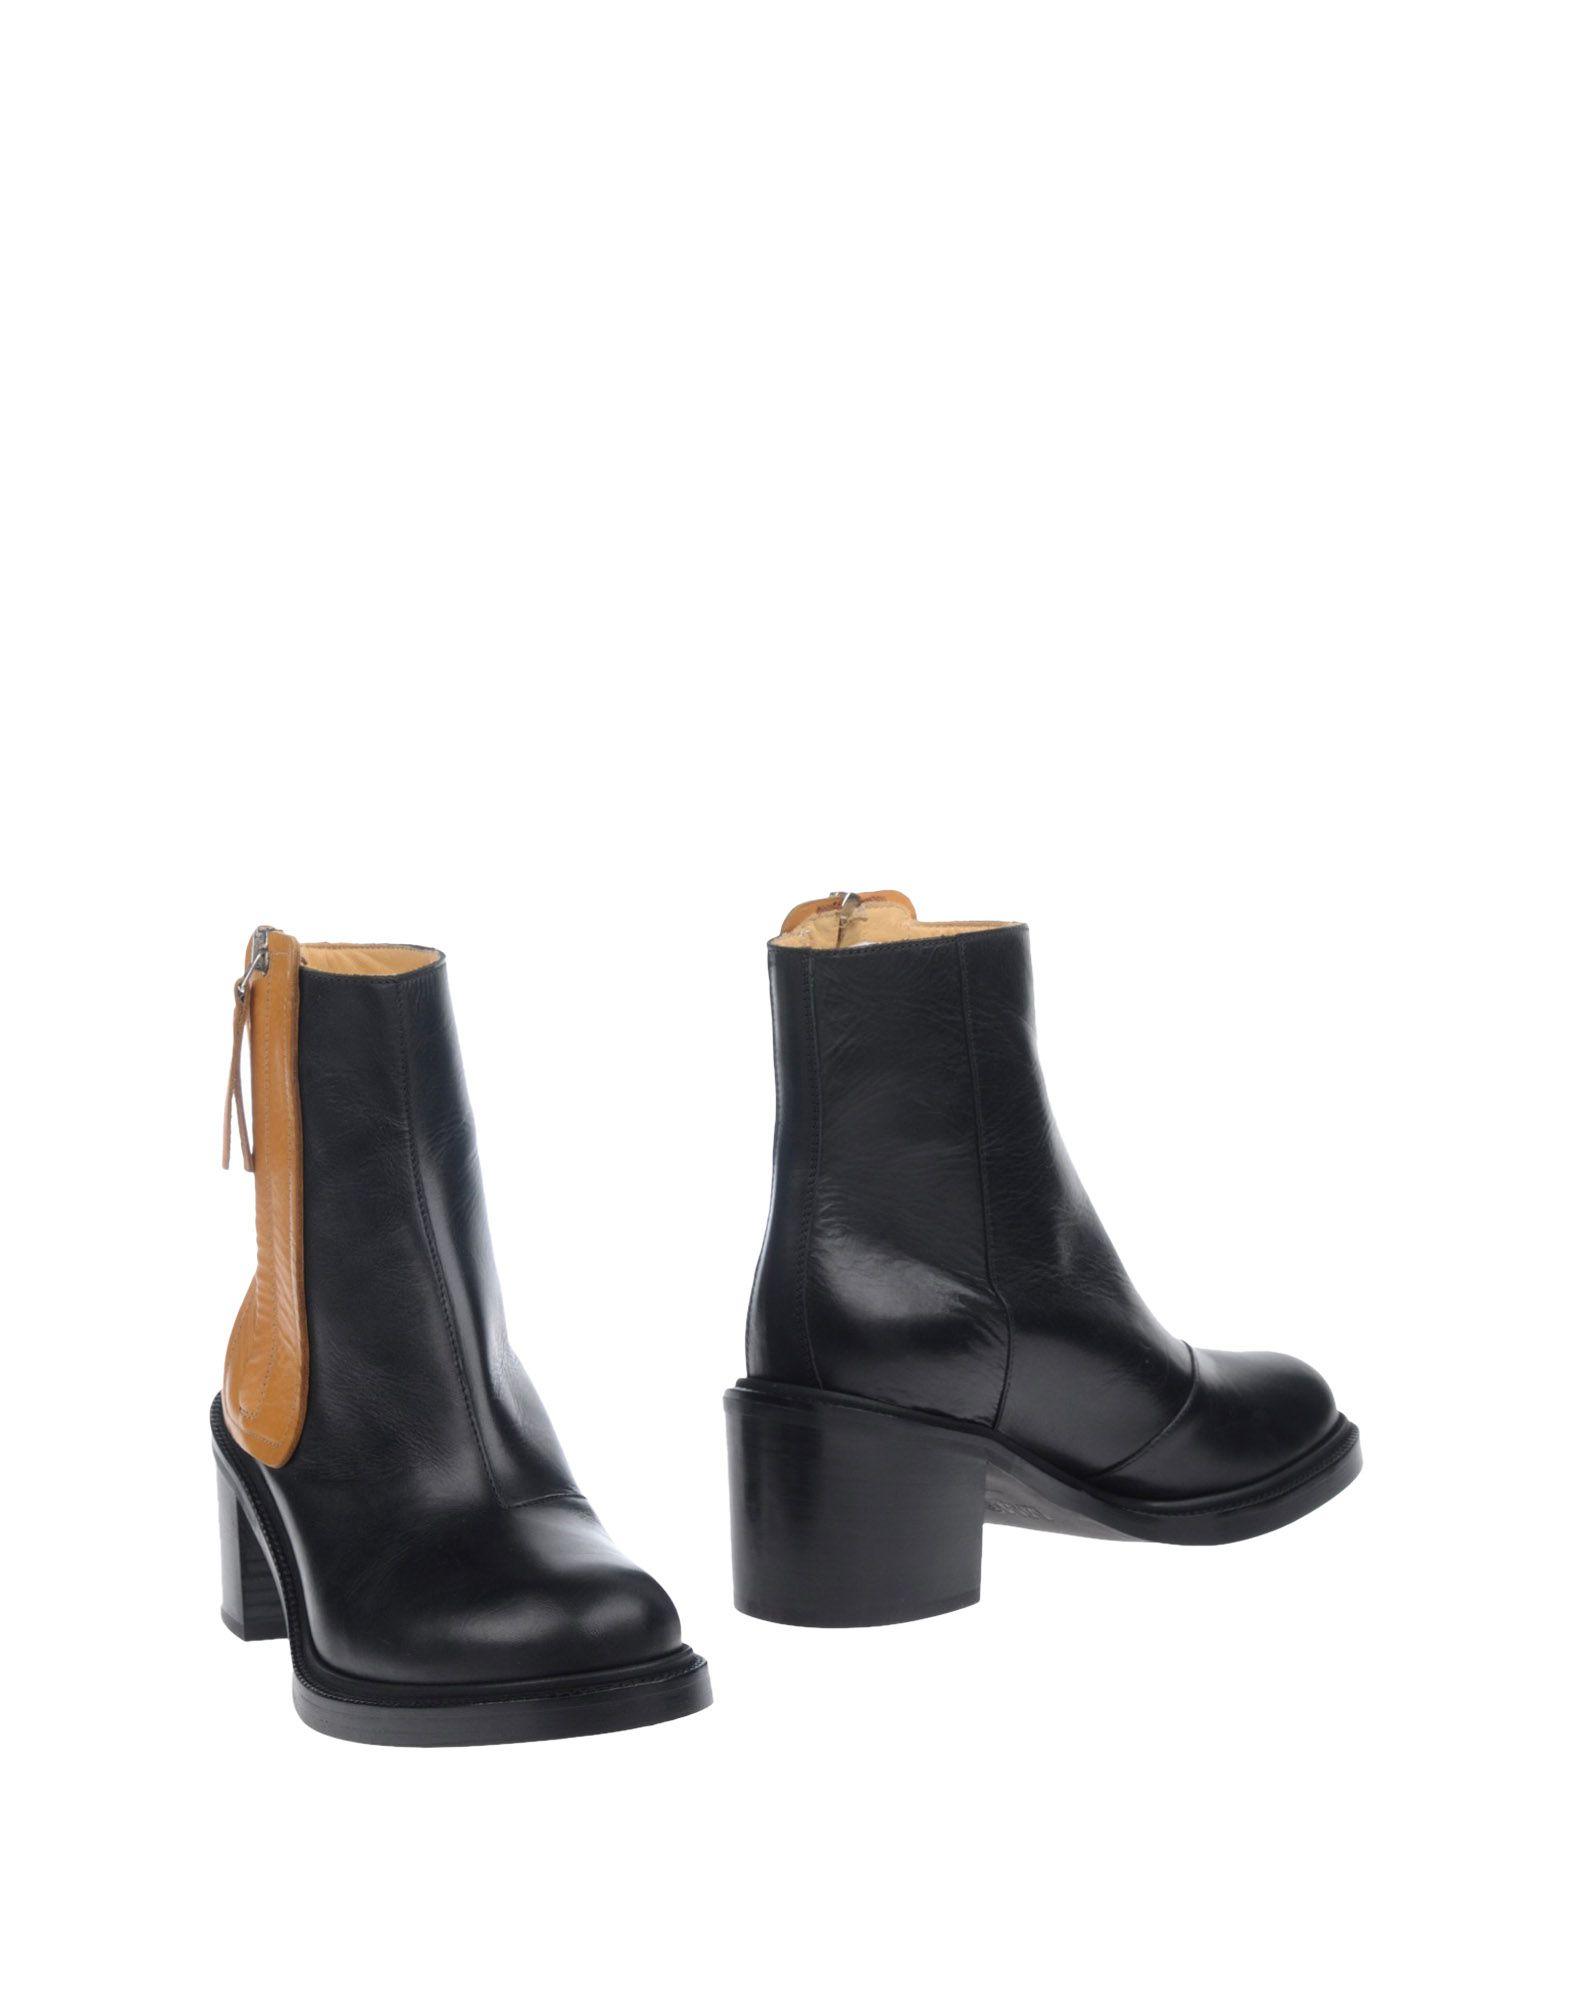 Rabatt  Schuhe Mm6 Maison Margiela Stiefelette Damen  Rabatt 11293390QB 336397